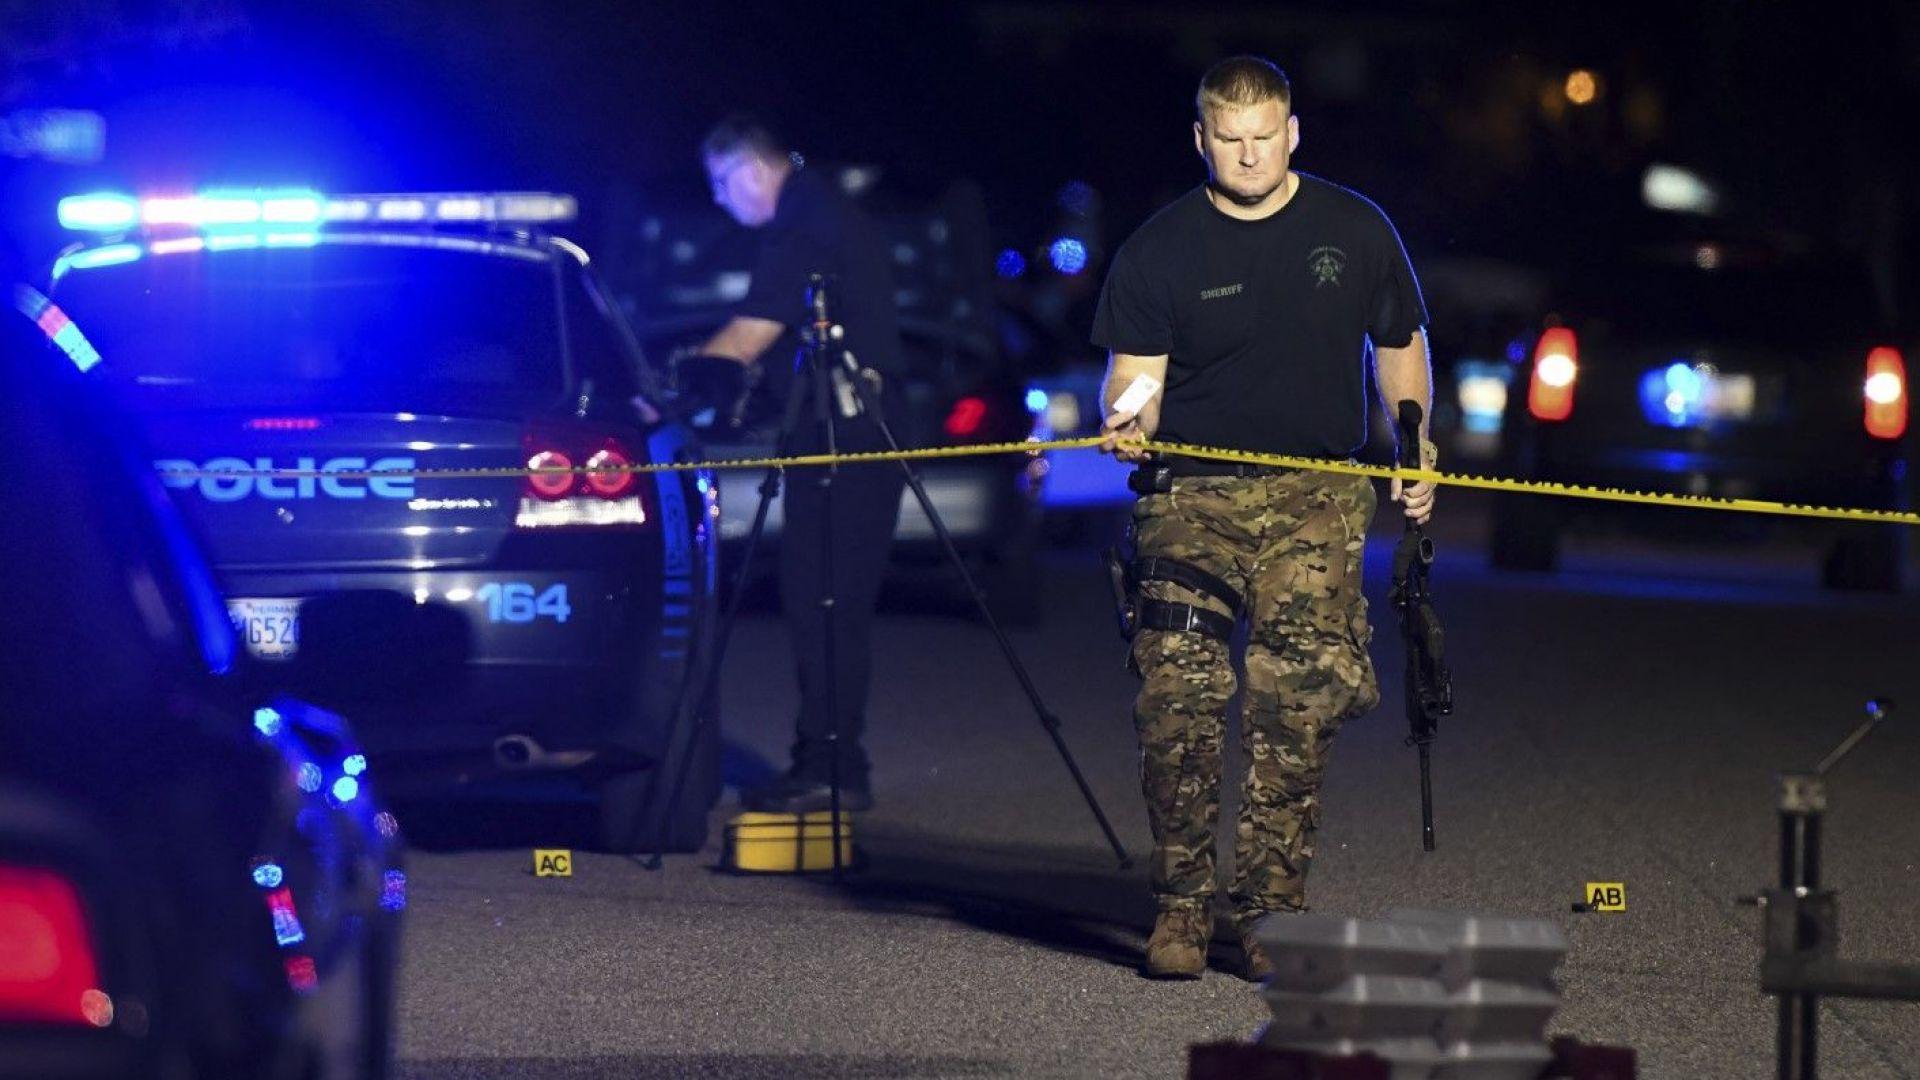 Серия от масови стрелби в САЩ взеха жертви и породиха сериозна тревога